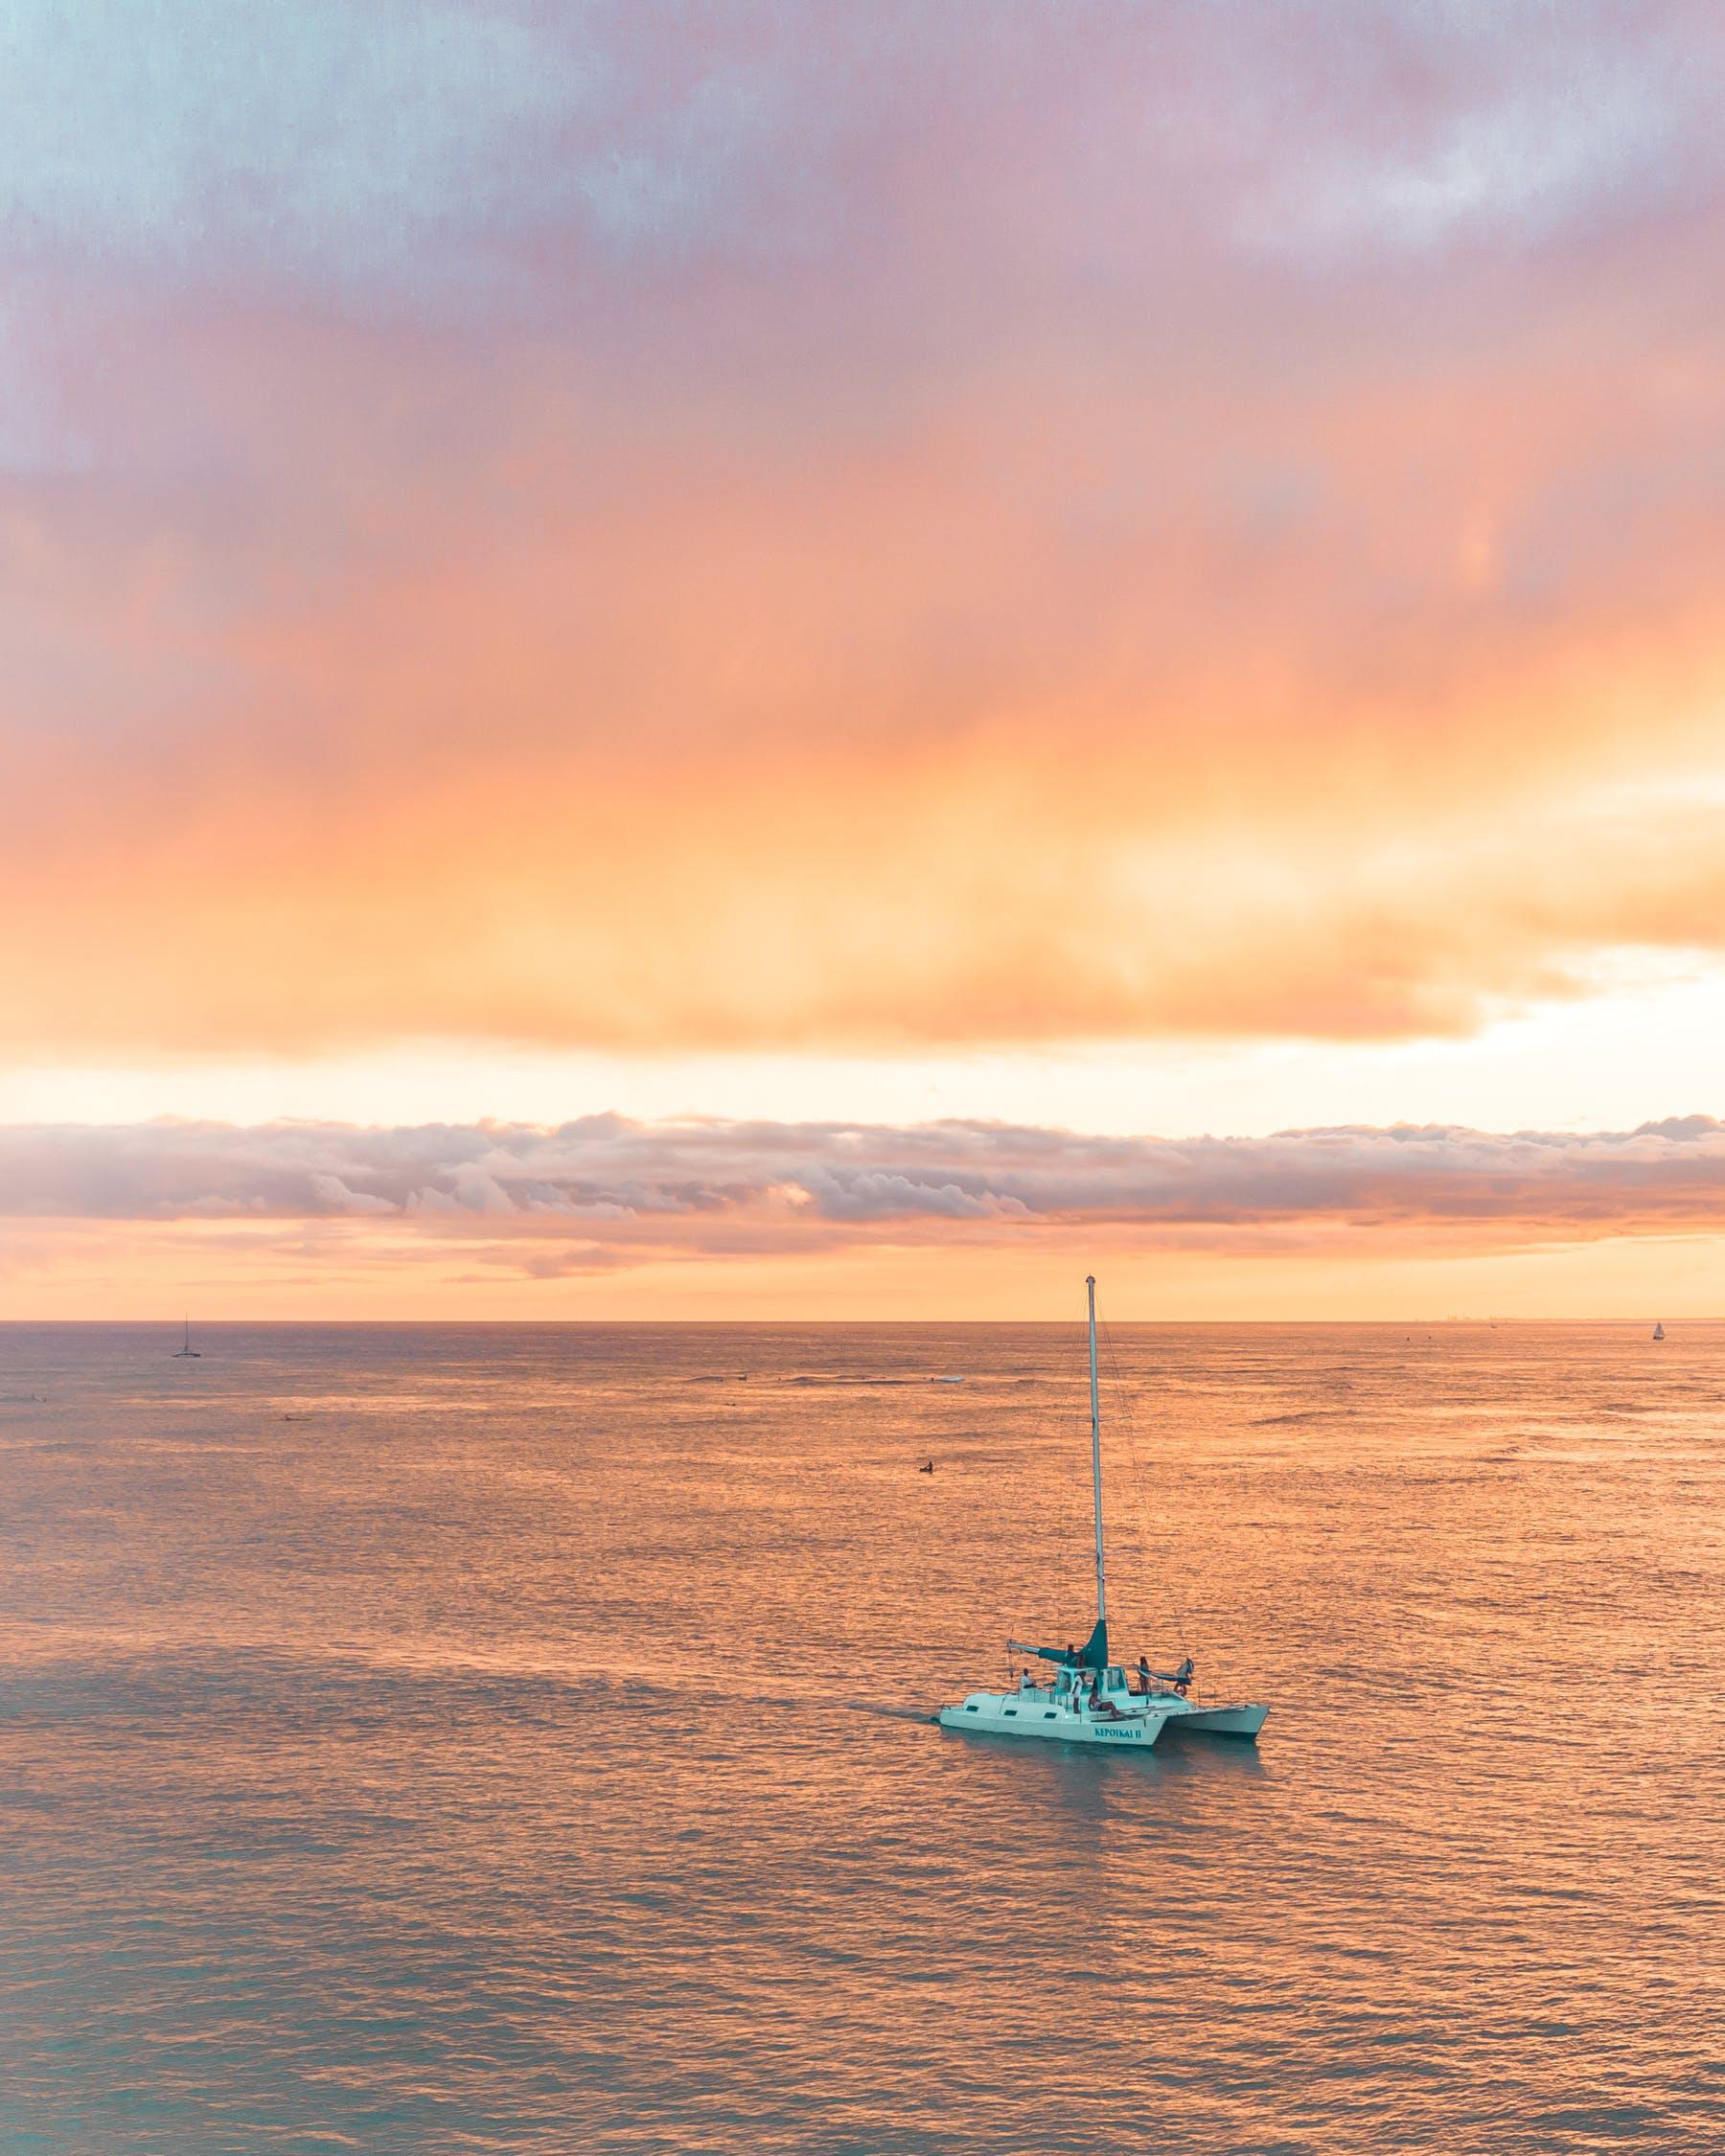 Malte en bateau